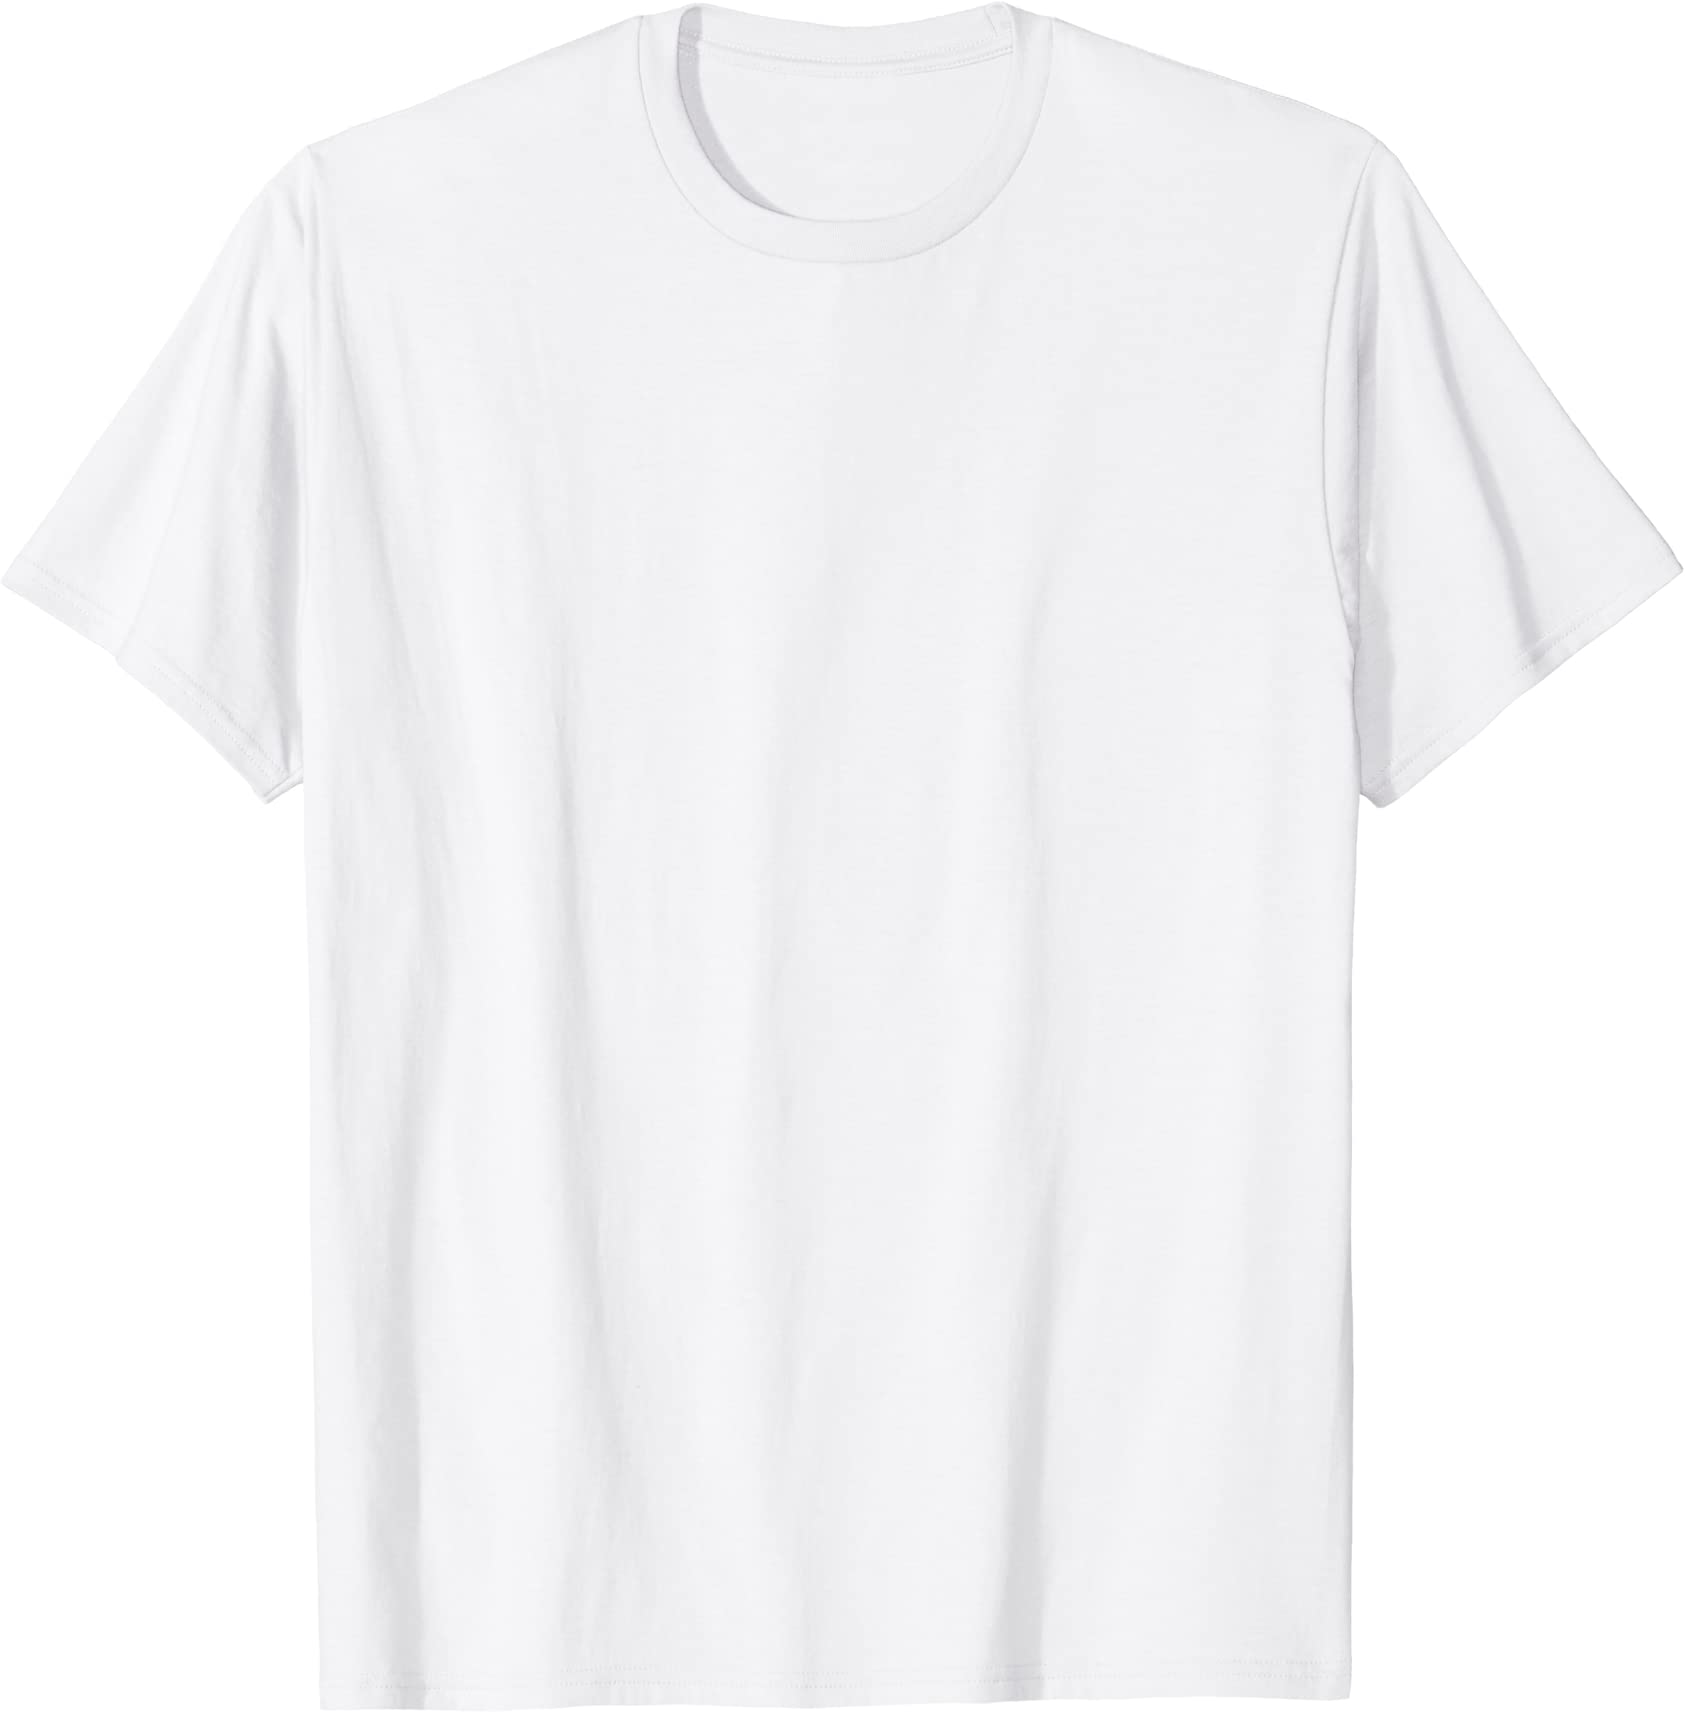 Ferris Bueller Funny T Shirt Life Moves Pretty Fast Unisex T Shirt Top Tee